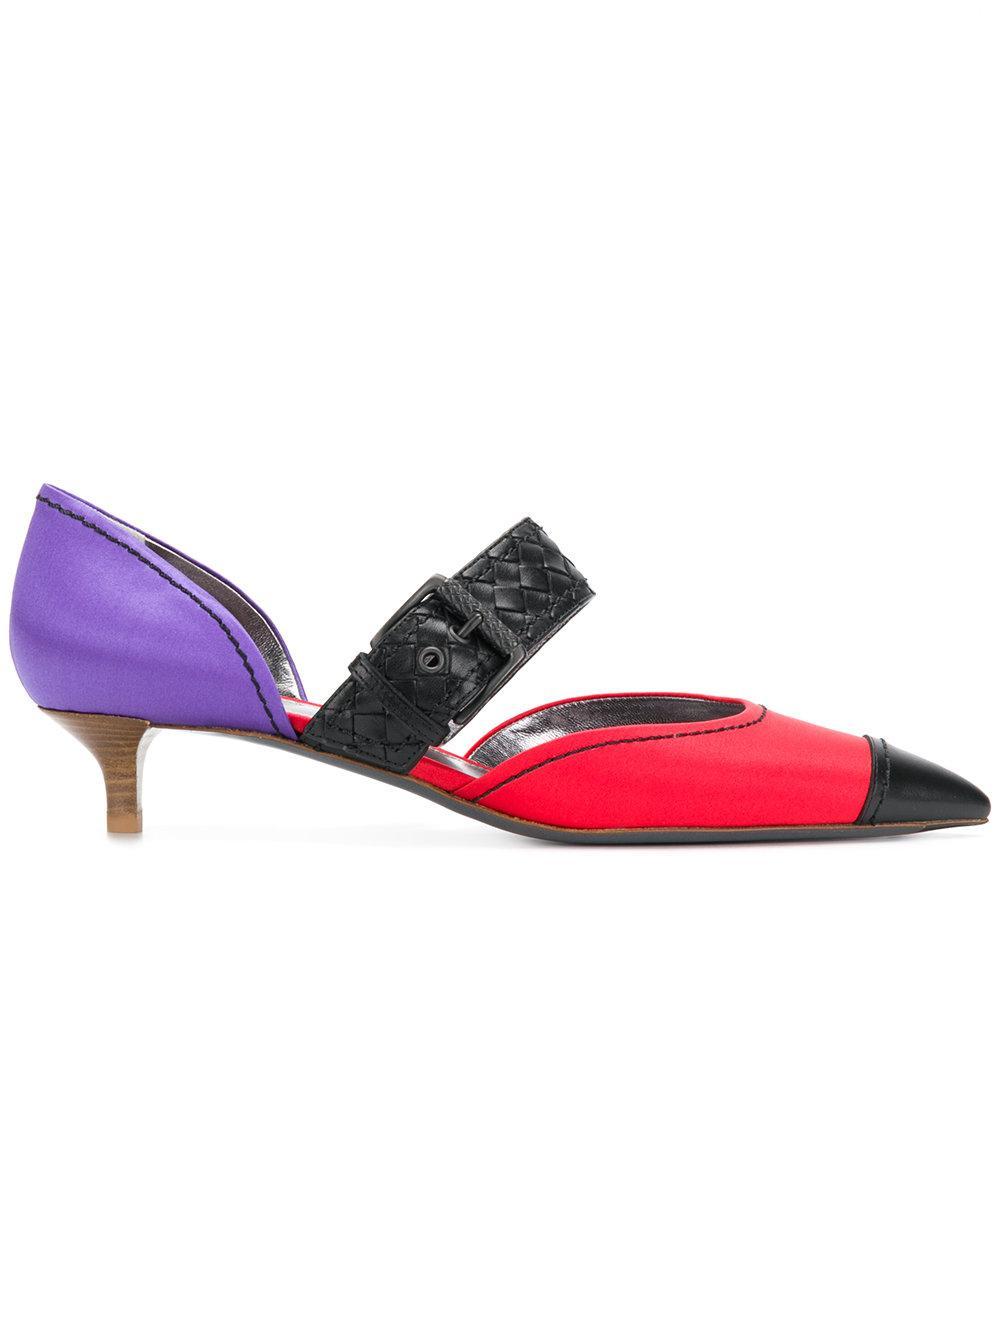 Bottega Veneta Woven Strap Kitten Heel Pumps - Multicolour